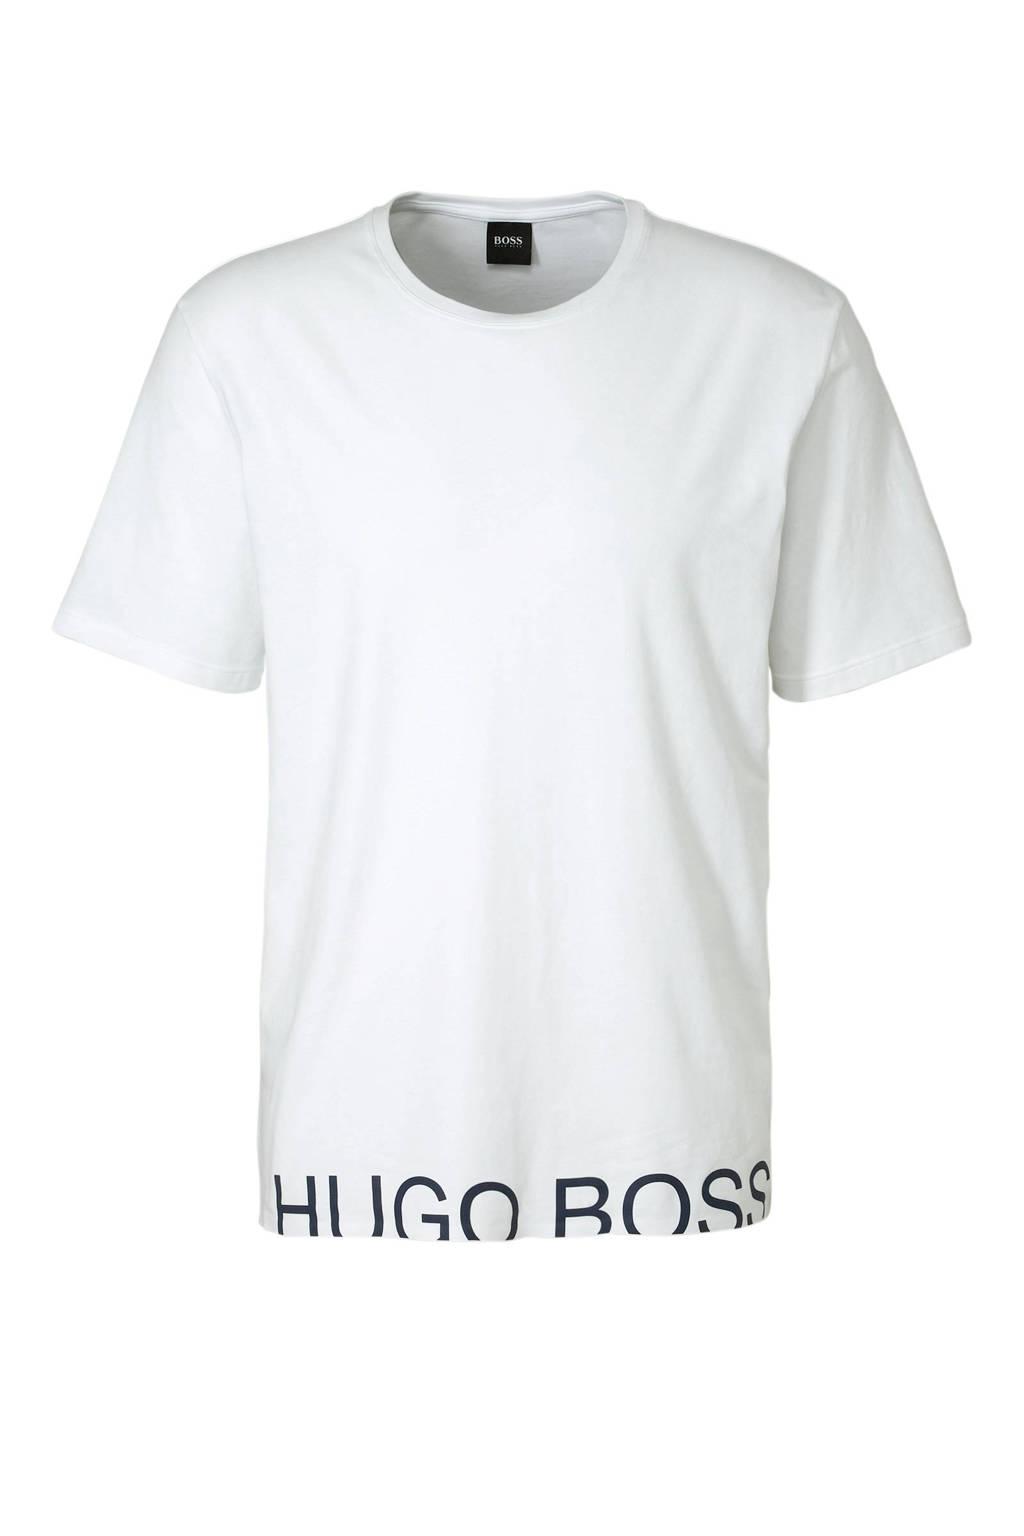 Boss T-shirt wit, Wit